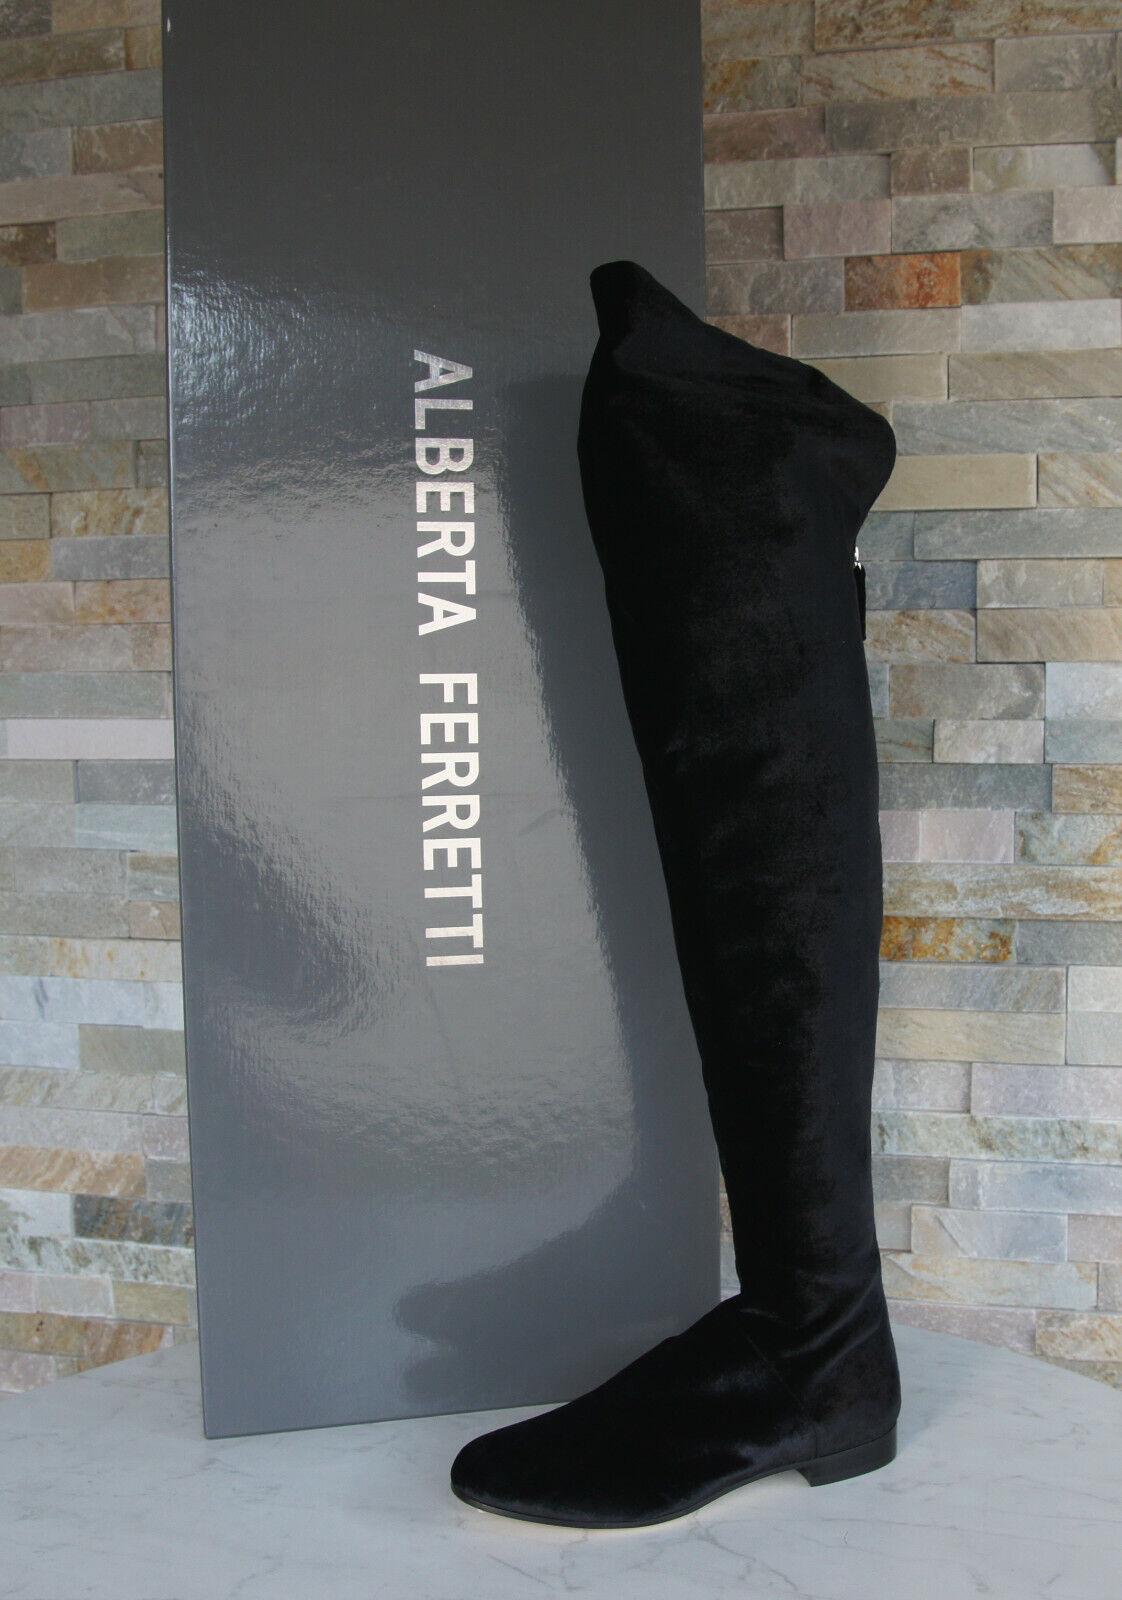 ALBERTA FERRETTI Gr 39 Stiefel Overknees Schuhe Samt schwarz NEU ehem.